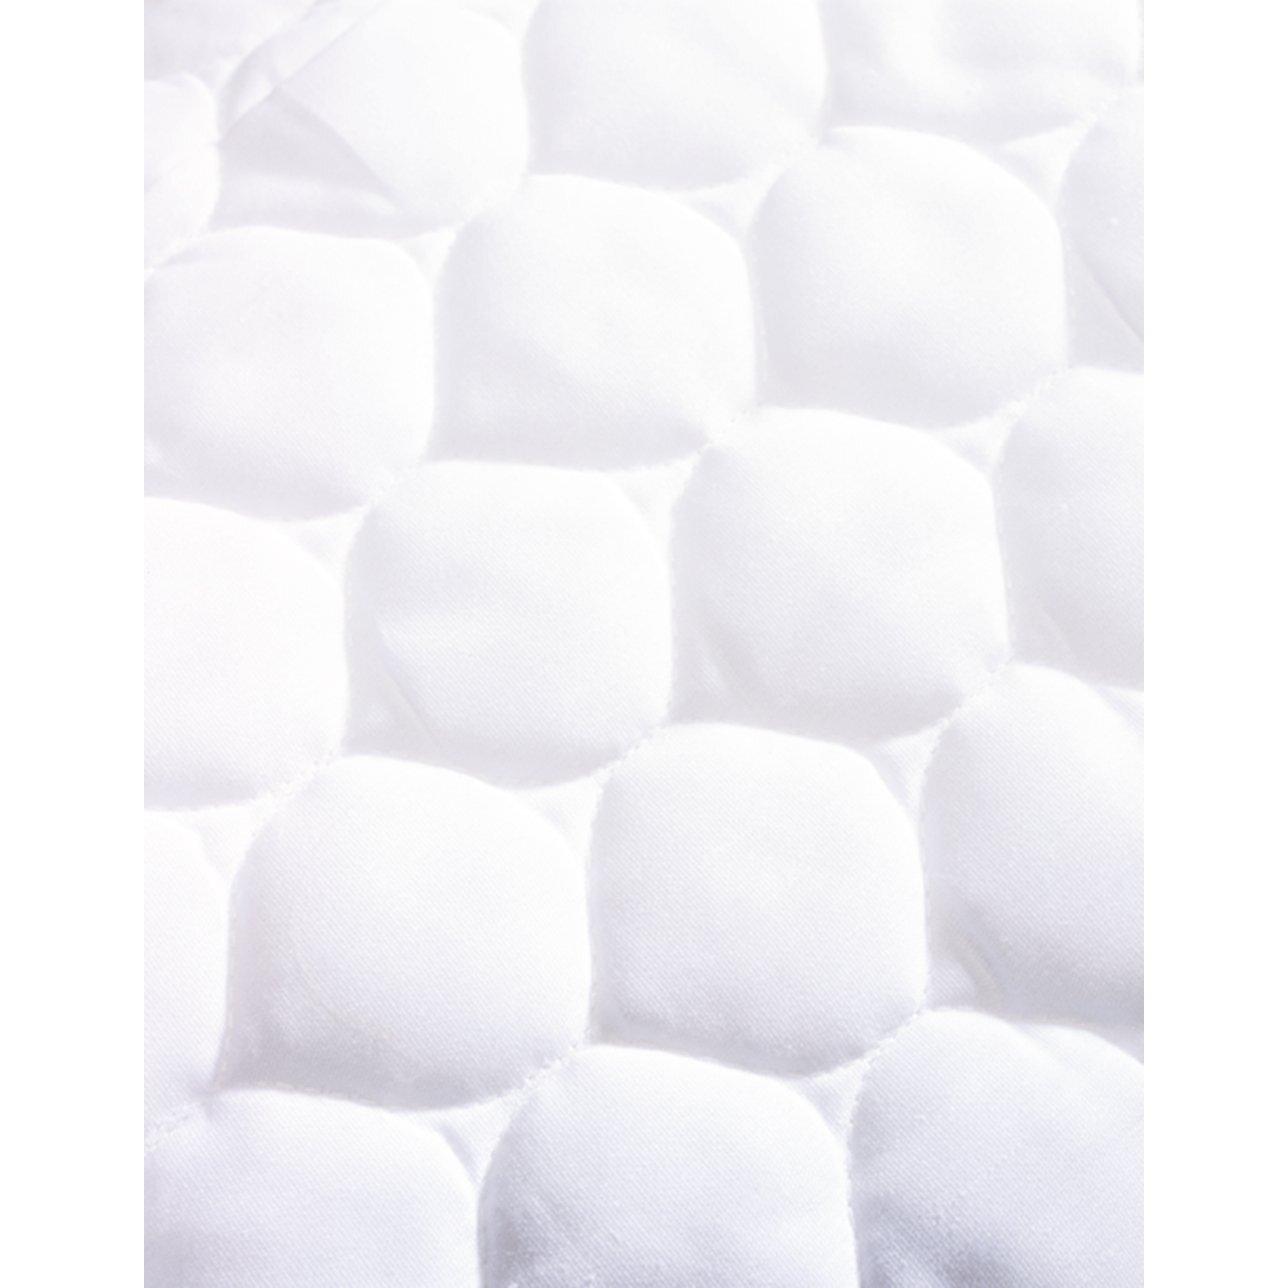 Best baby crib mattress pad - American Baby Company Waterproof Quilted Mini Crib Mattress Pad